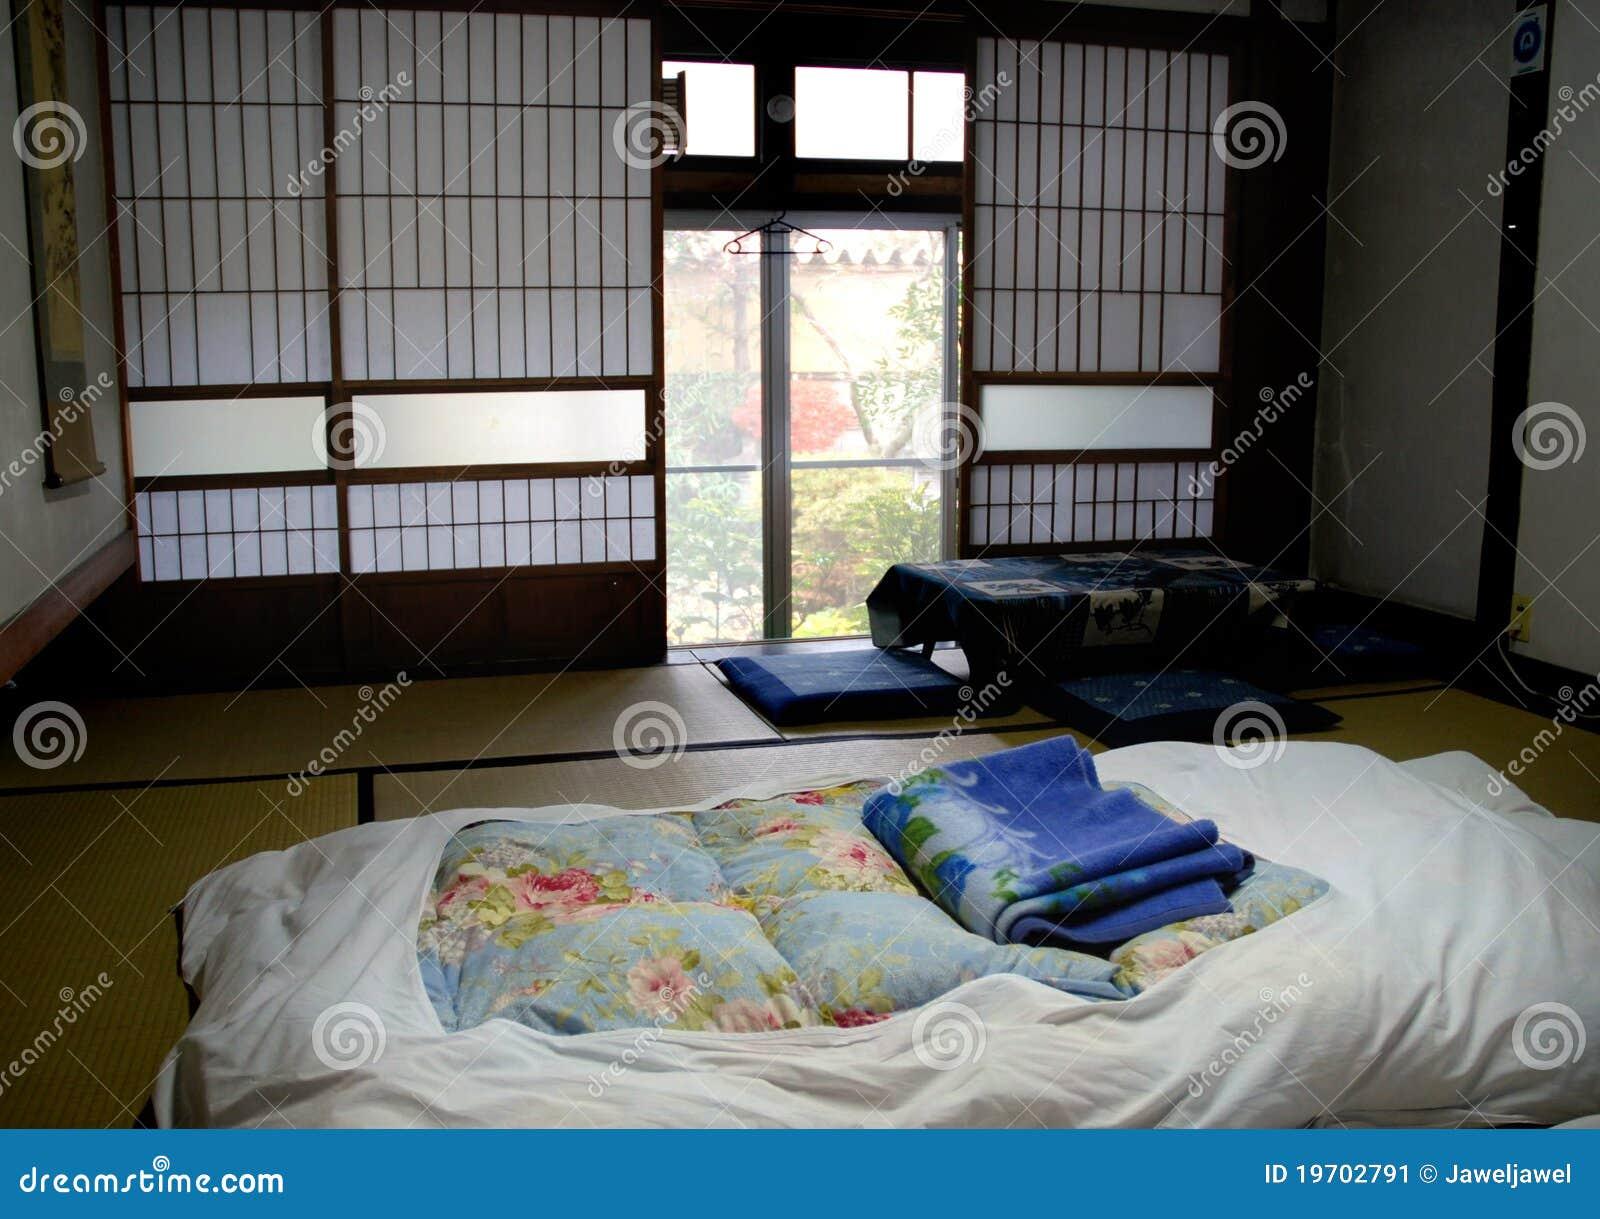 japanisches schlafzimmer stockbild bild 19702791. Black Bedroom Furniture Sets. Home Design Ideas